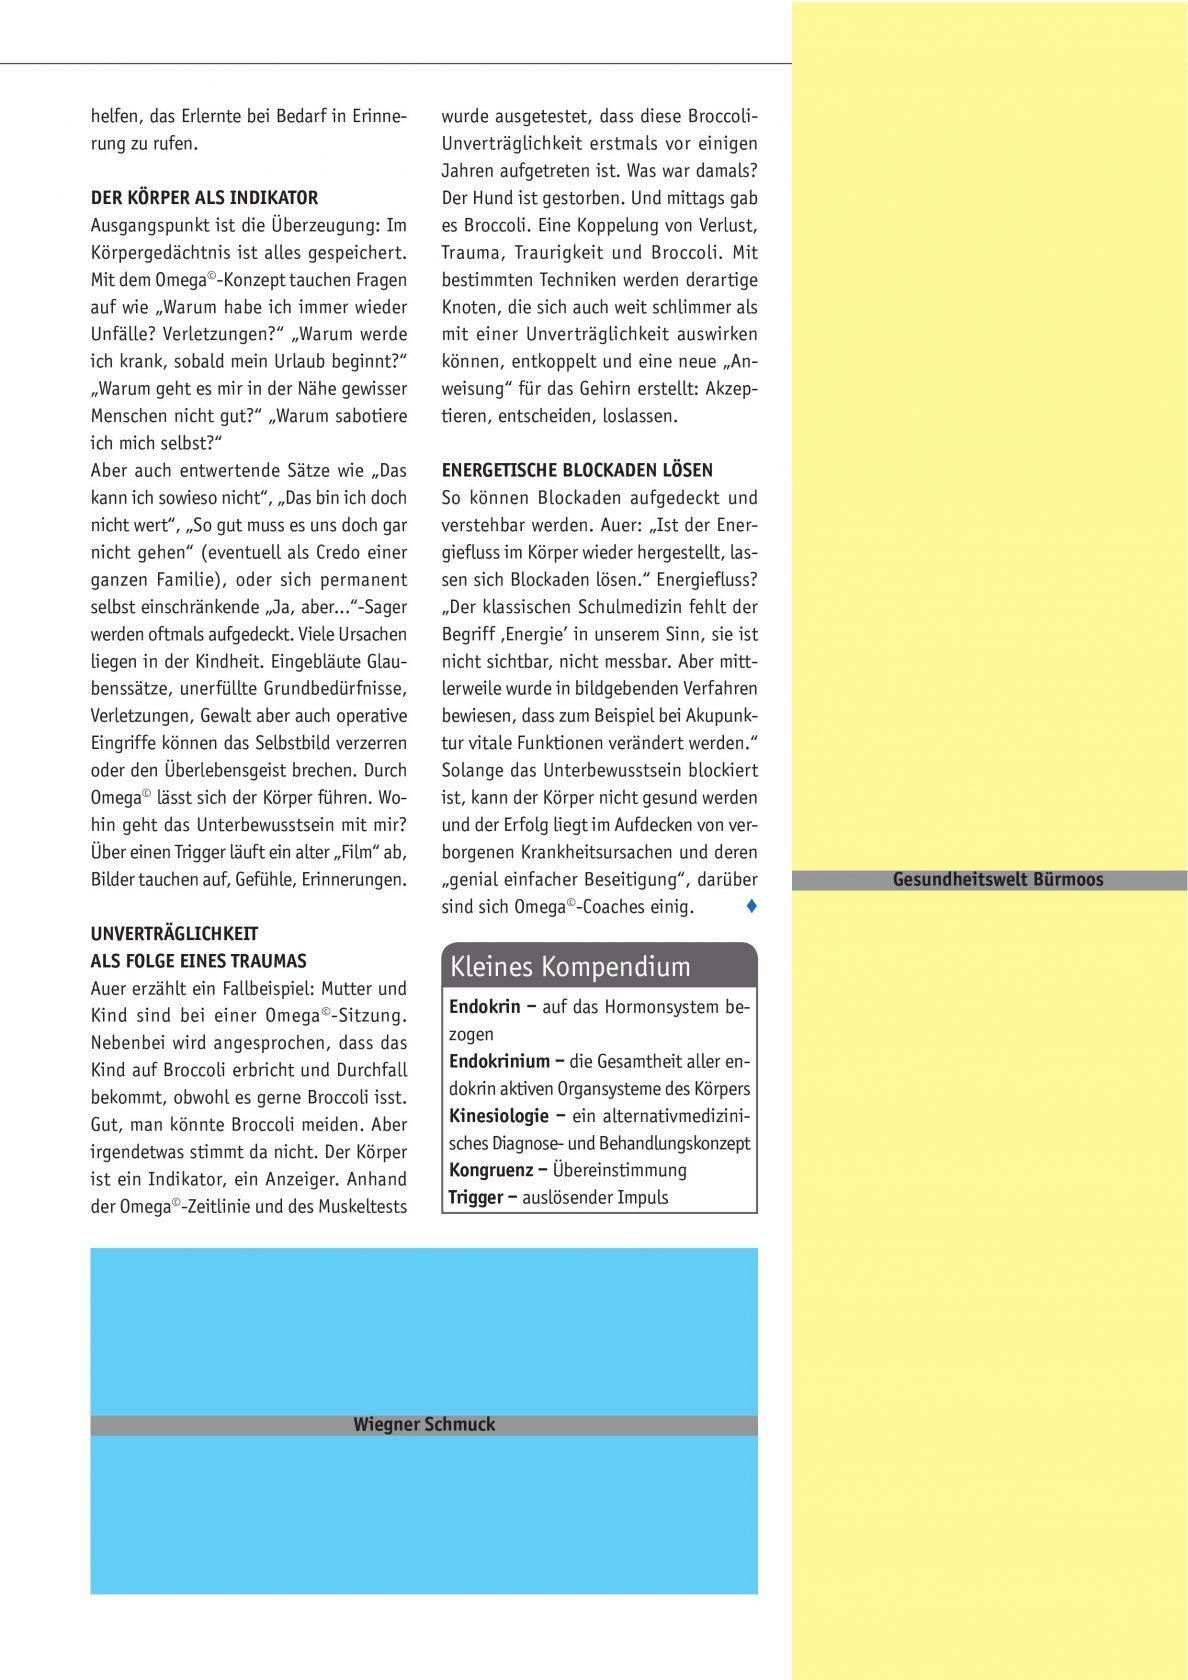 salzachbruecke-artikel-omega-healing-harald-auer-seite2